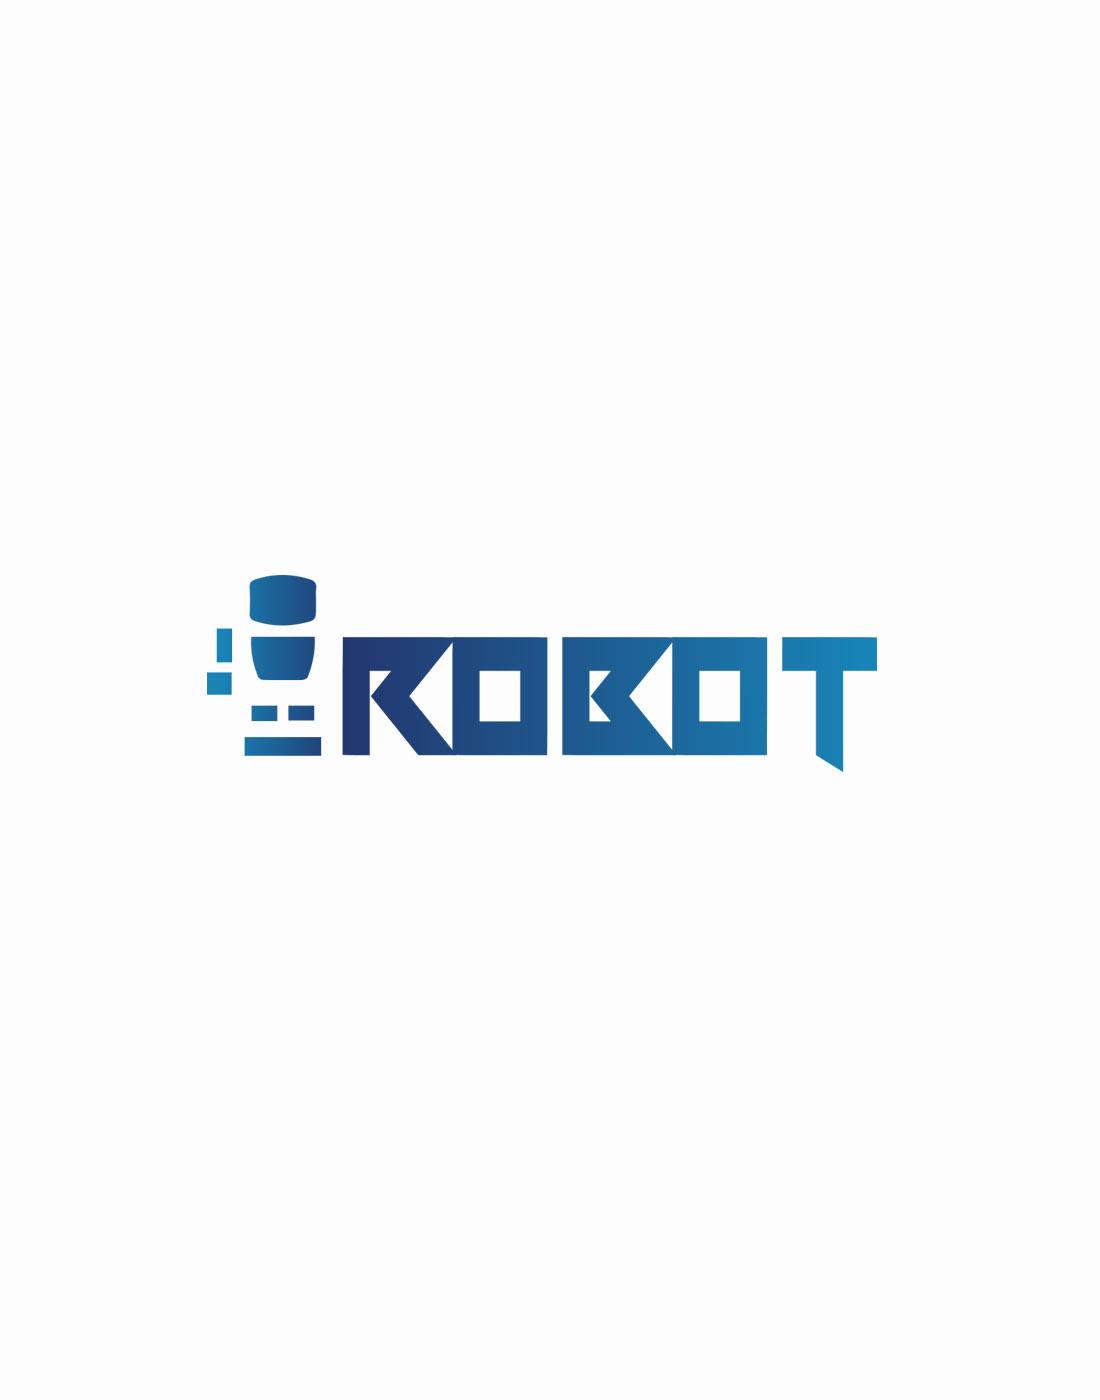 robot_logo_template